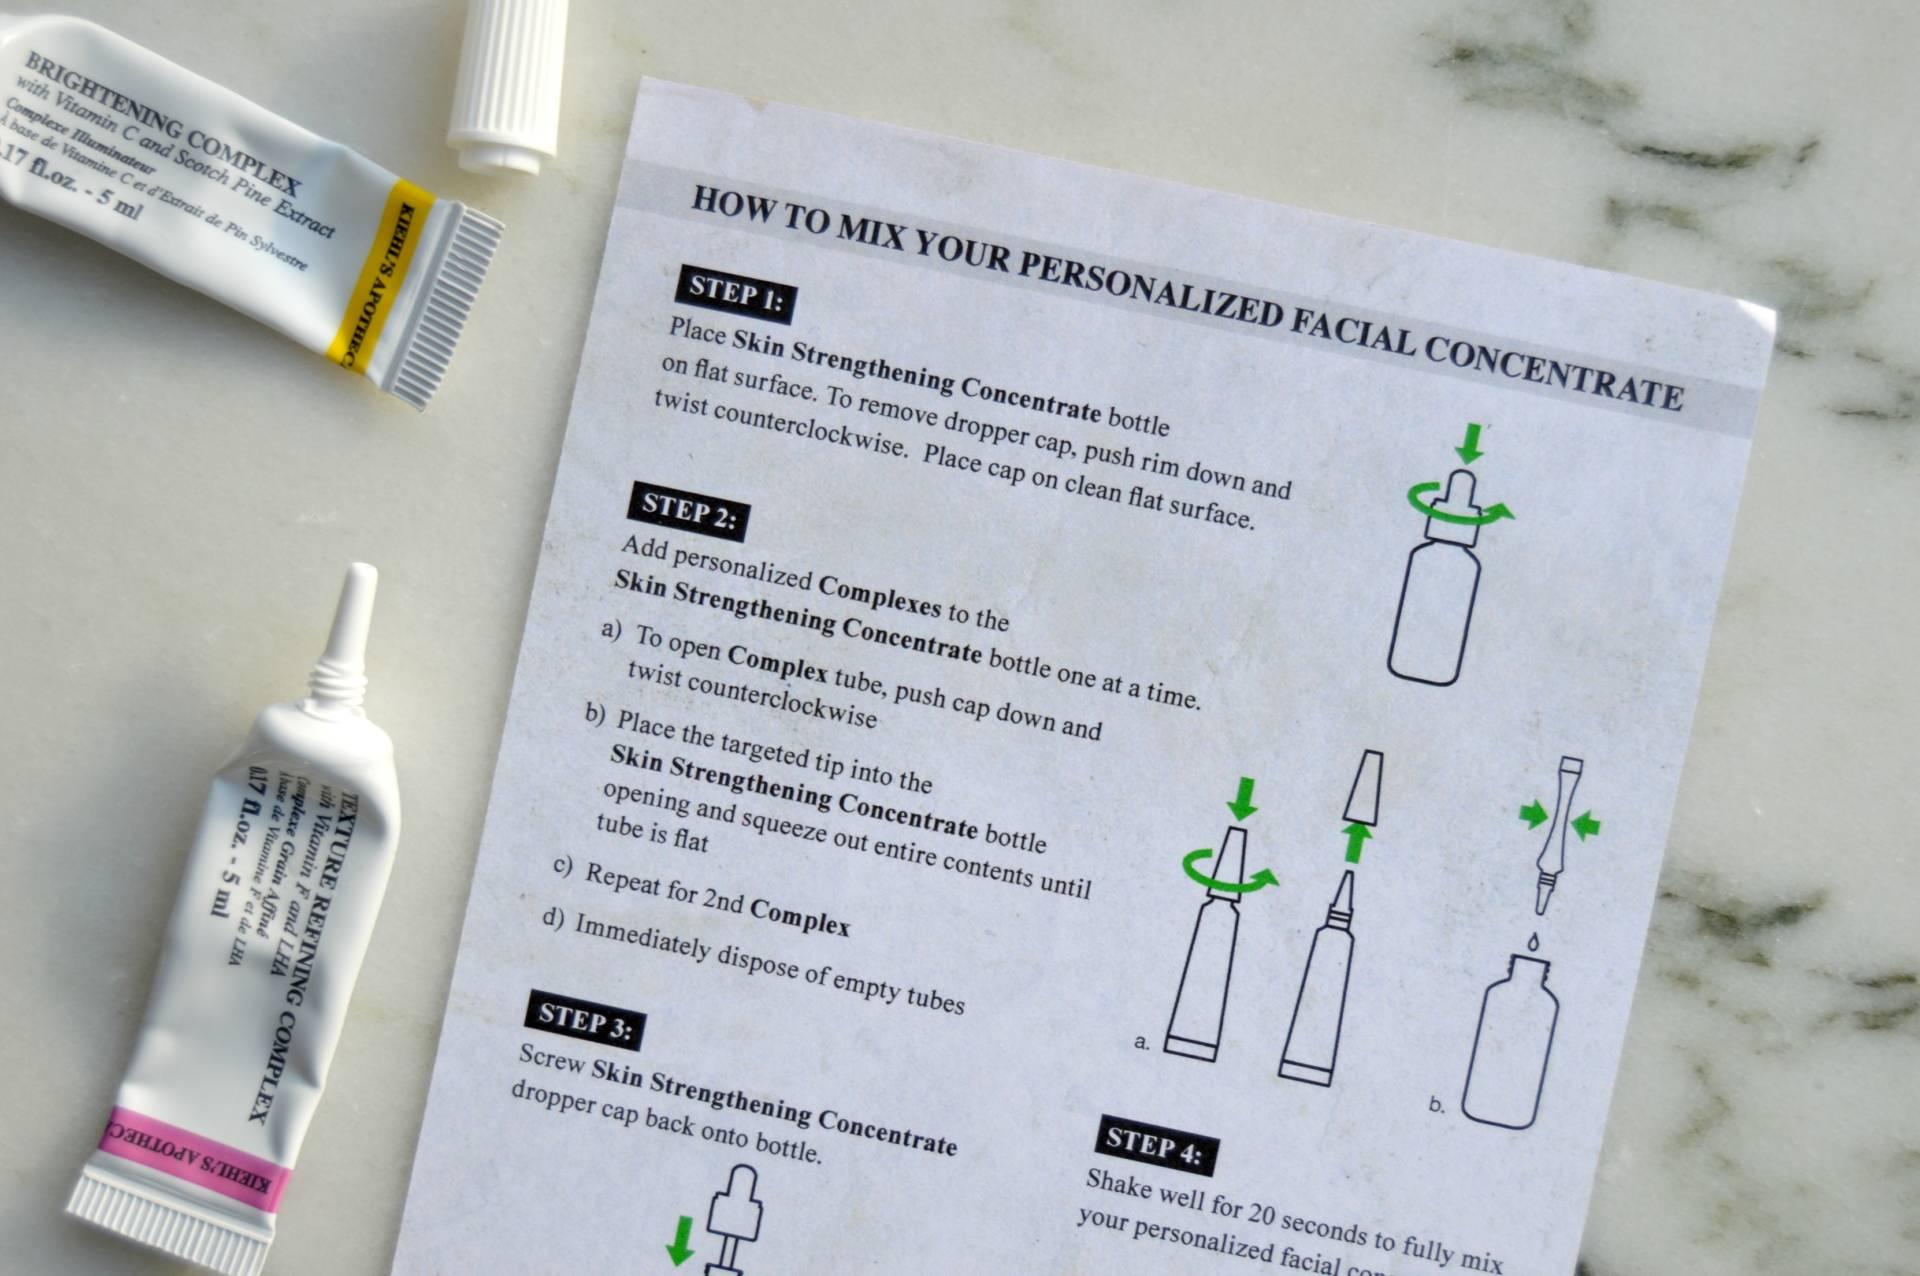 kiehls-serum-oil-blend-custom-inhautepursuit-apothecary-preparations